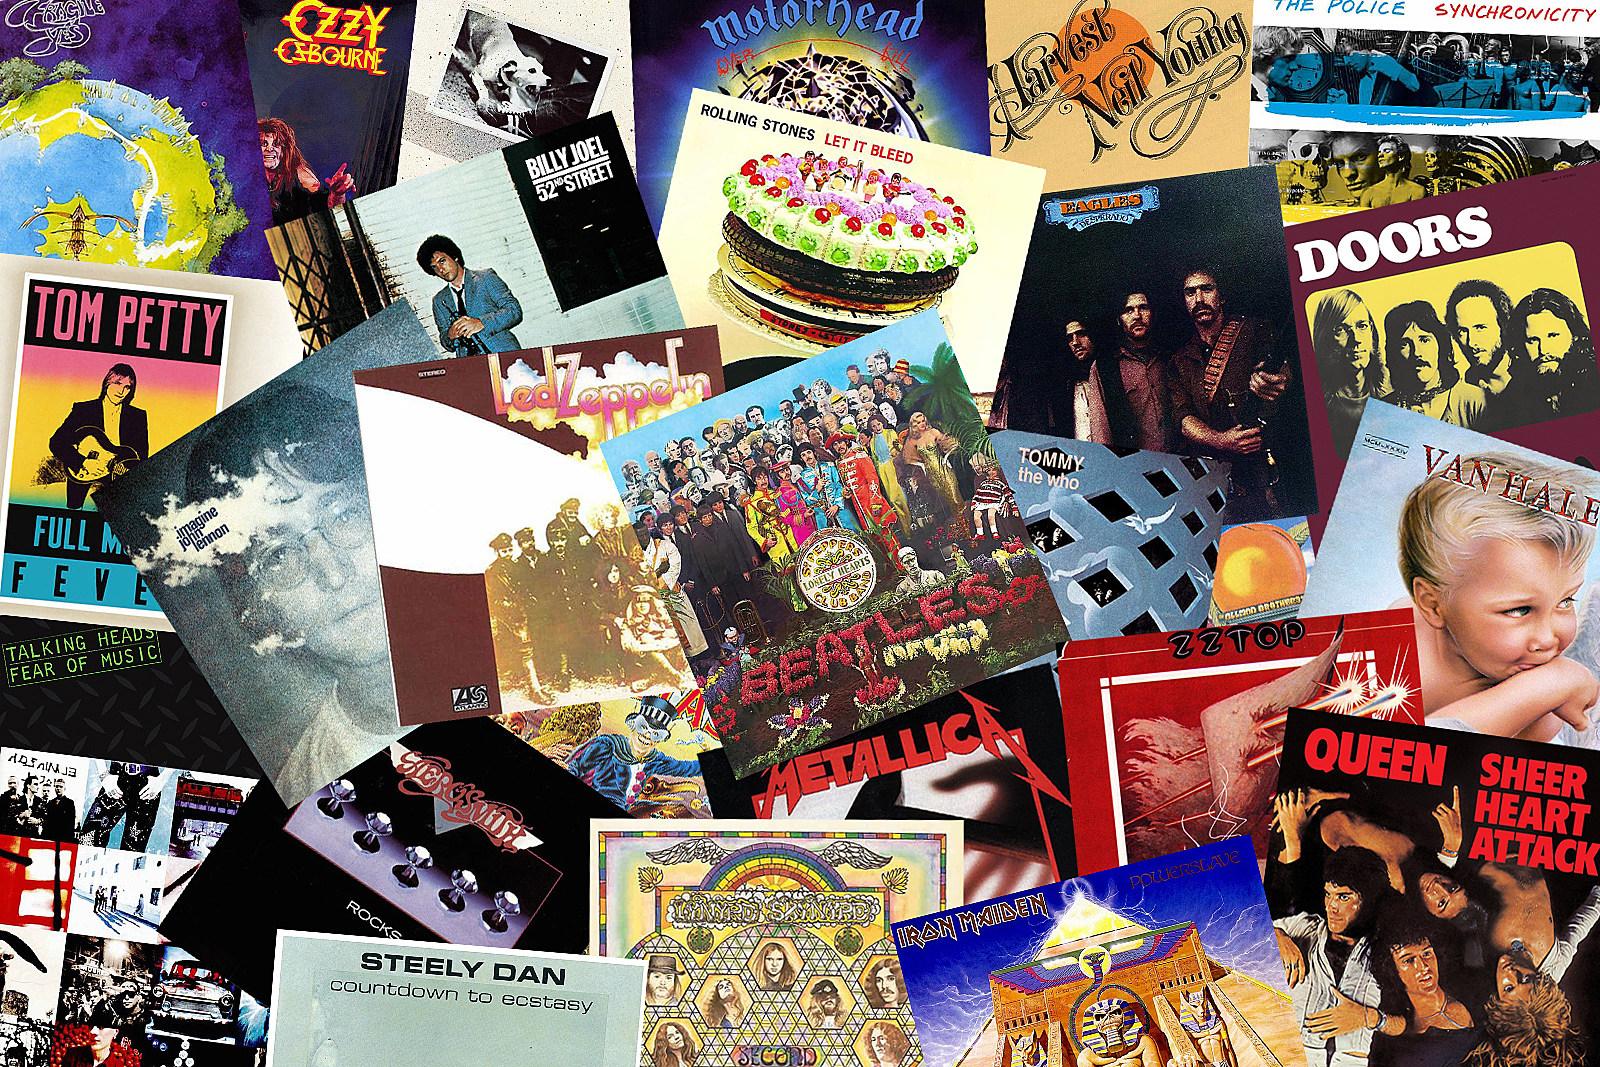 Classic rock music of the whole era